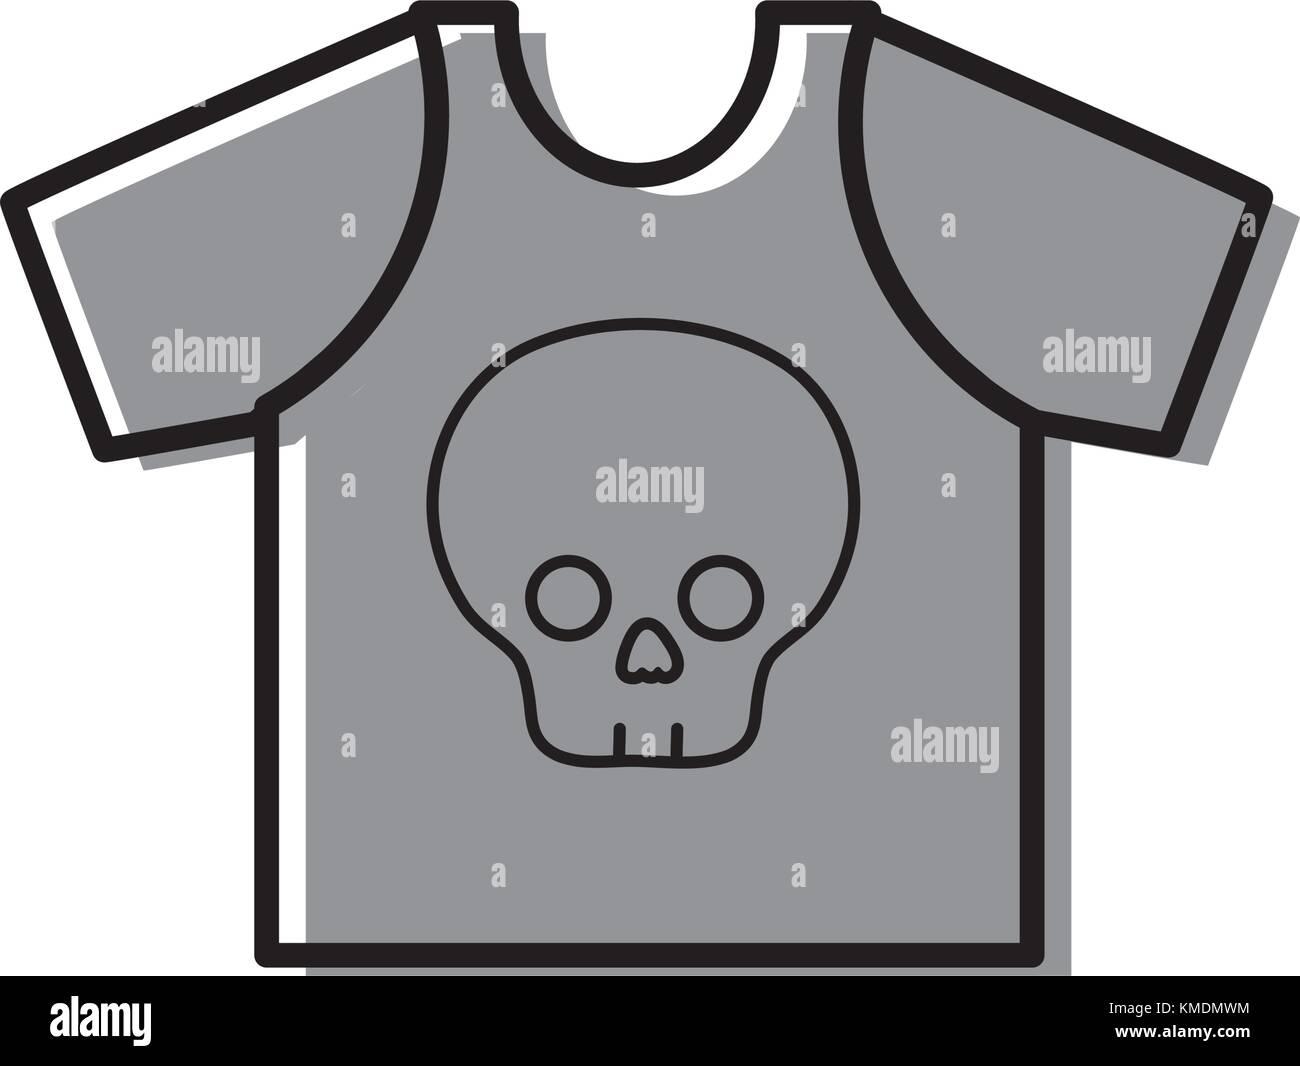 Color Rock T Shirt With Skull Design Casul Clothes Stock Vector Art